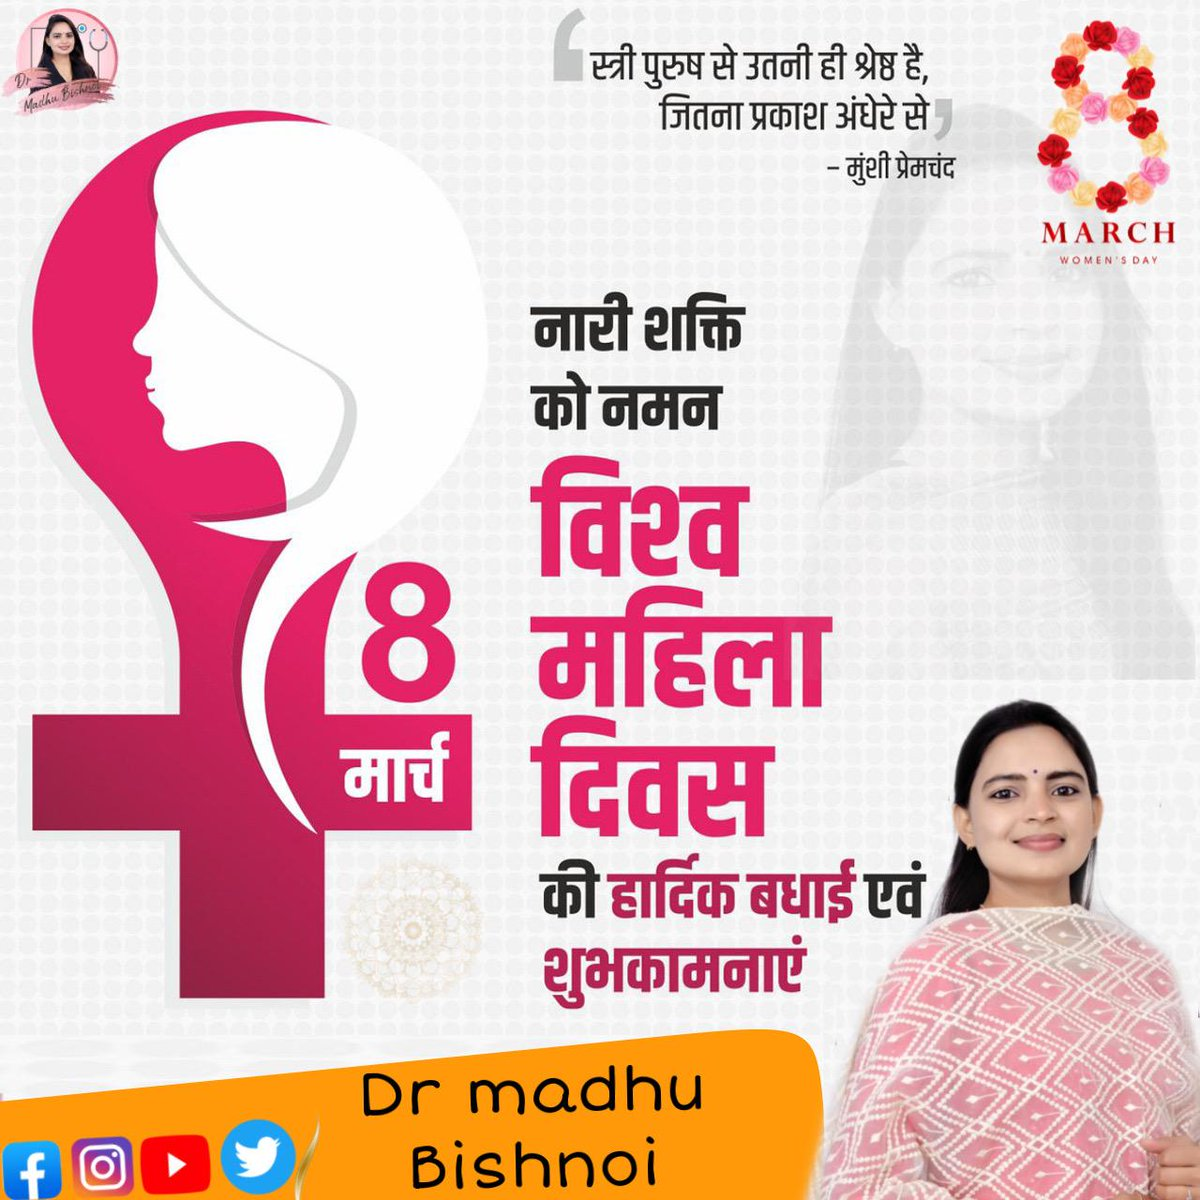 """नारी शक्ति को नमन 🙏 विश्व महिला दिवस की हार्दिक बधाई एवं शुभकामनाएं  #WomensDay #FridayMotivation #FridayThoughts #womenpower #PositiveVibesOnly"